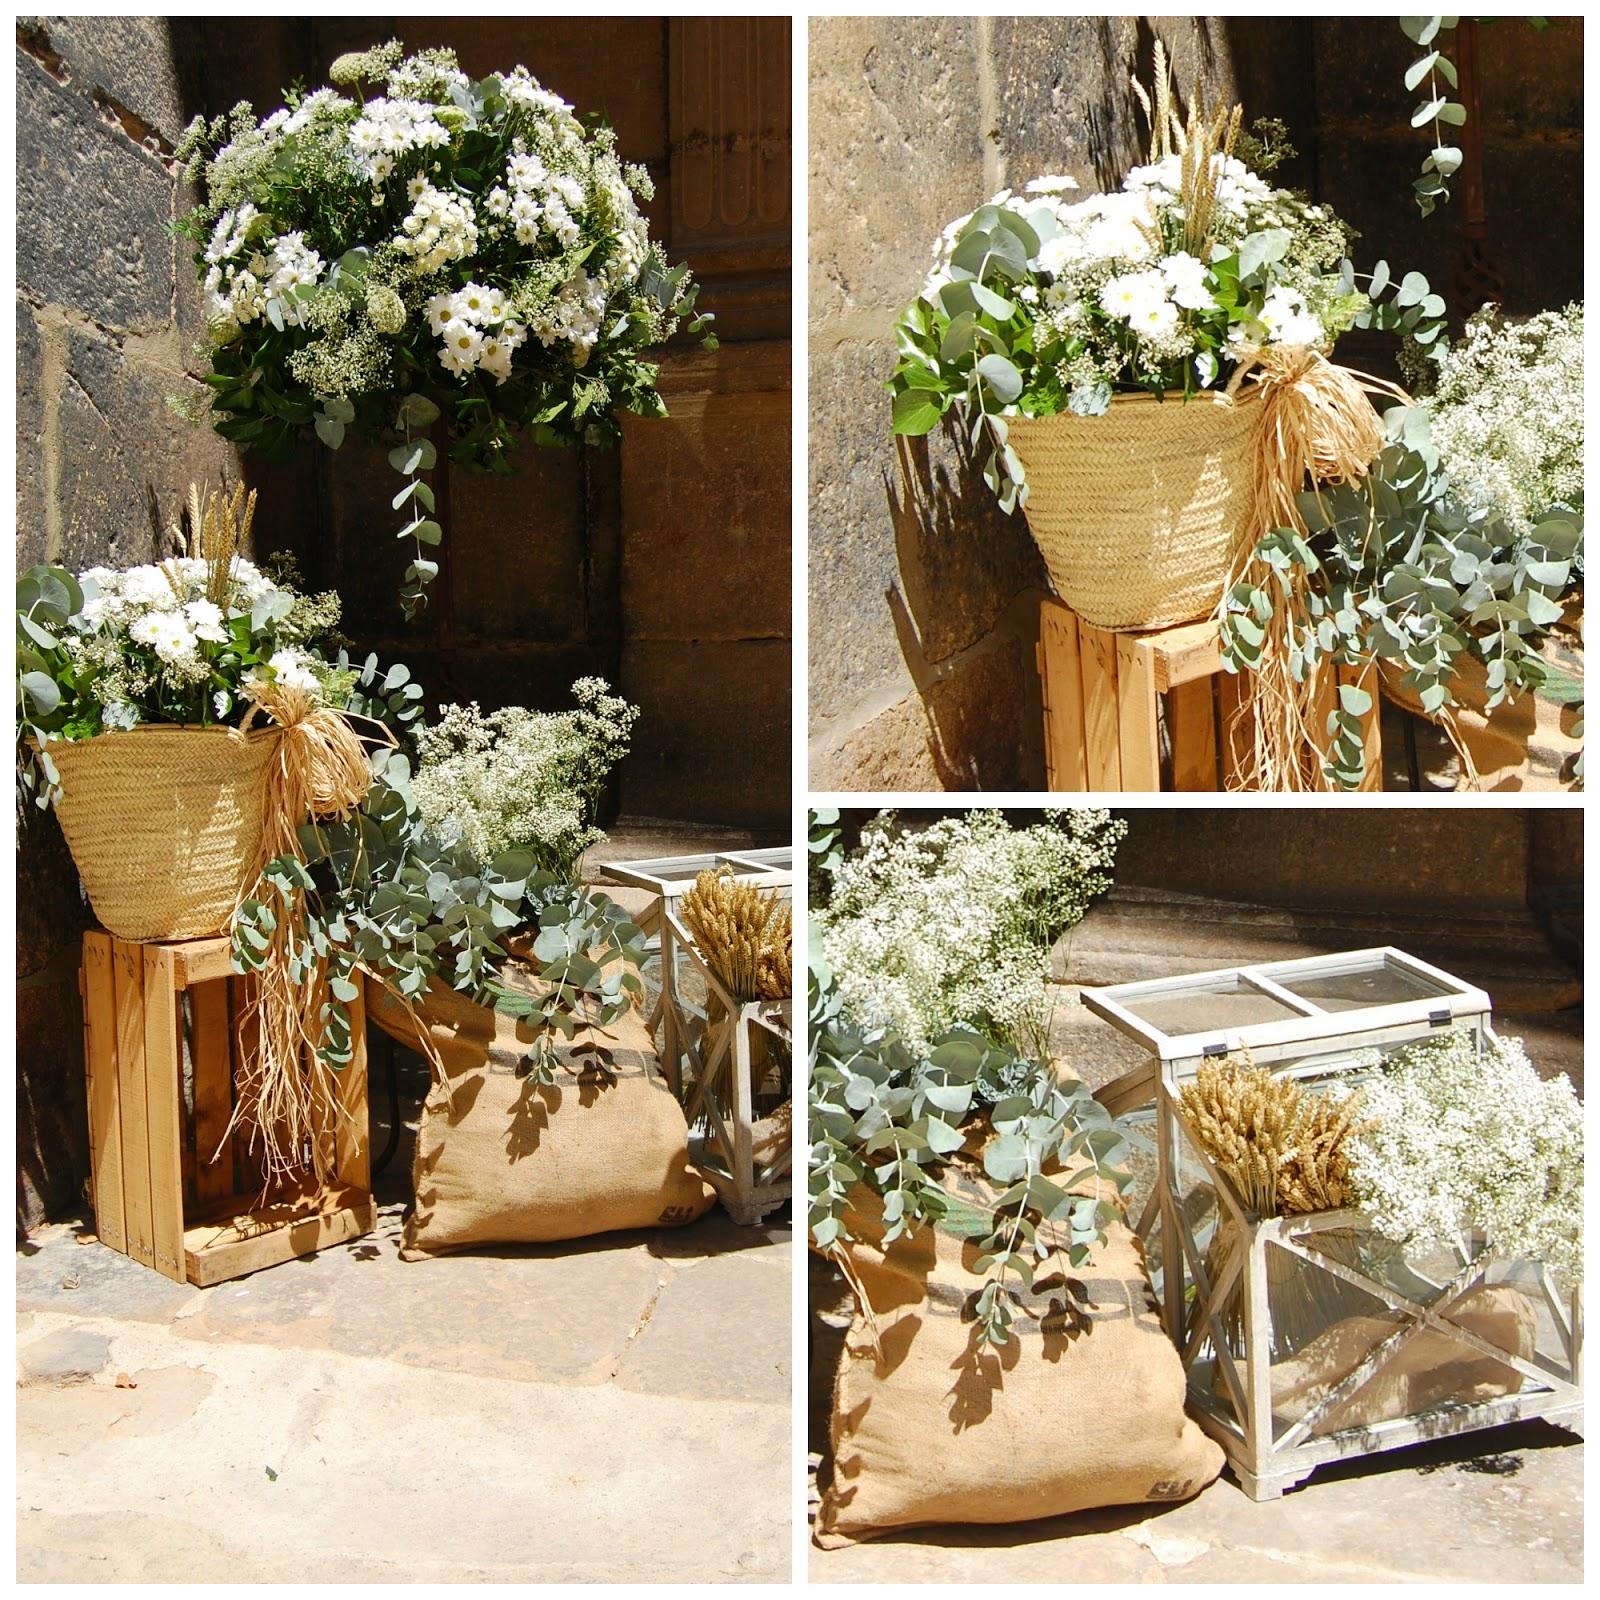 Momentips capazos para tu boda - Decoracion rustica fotos ...